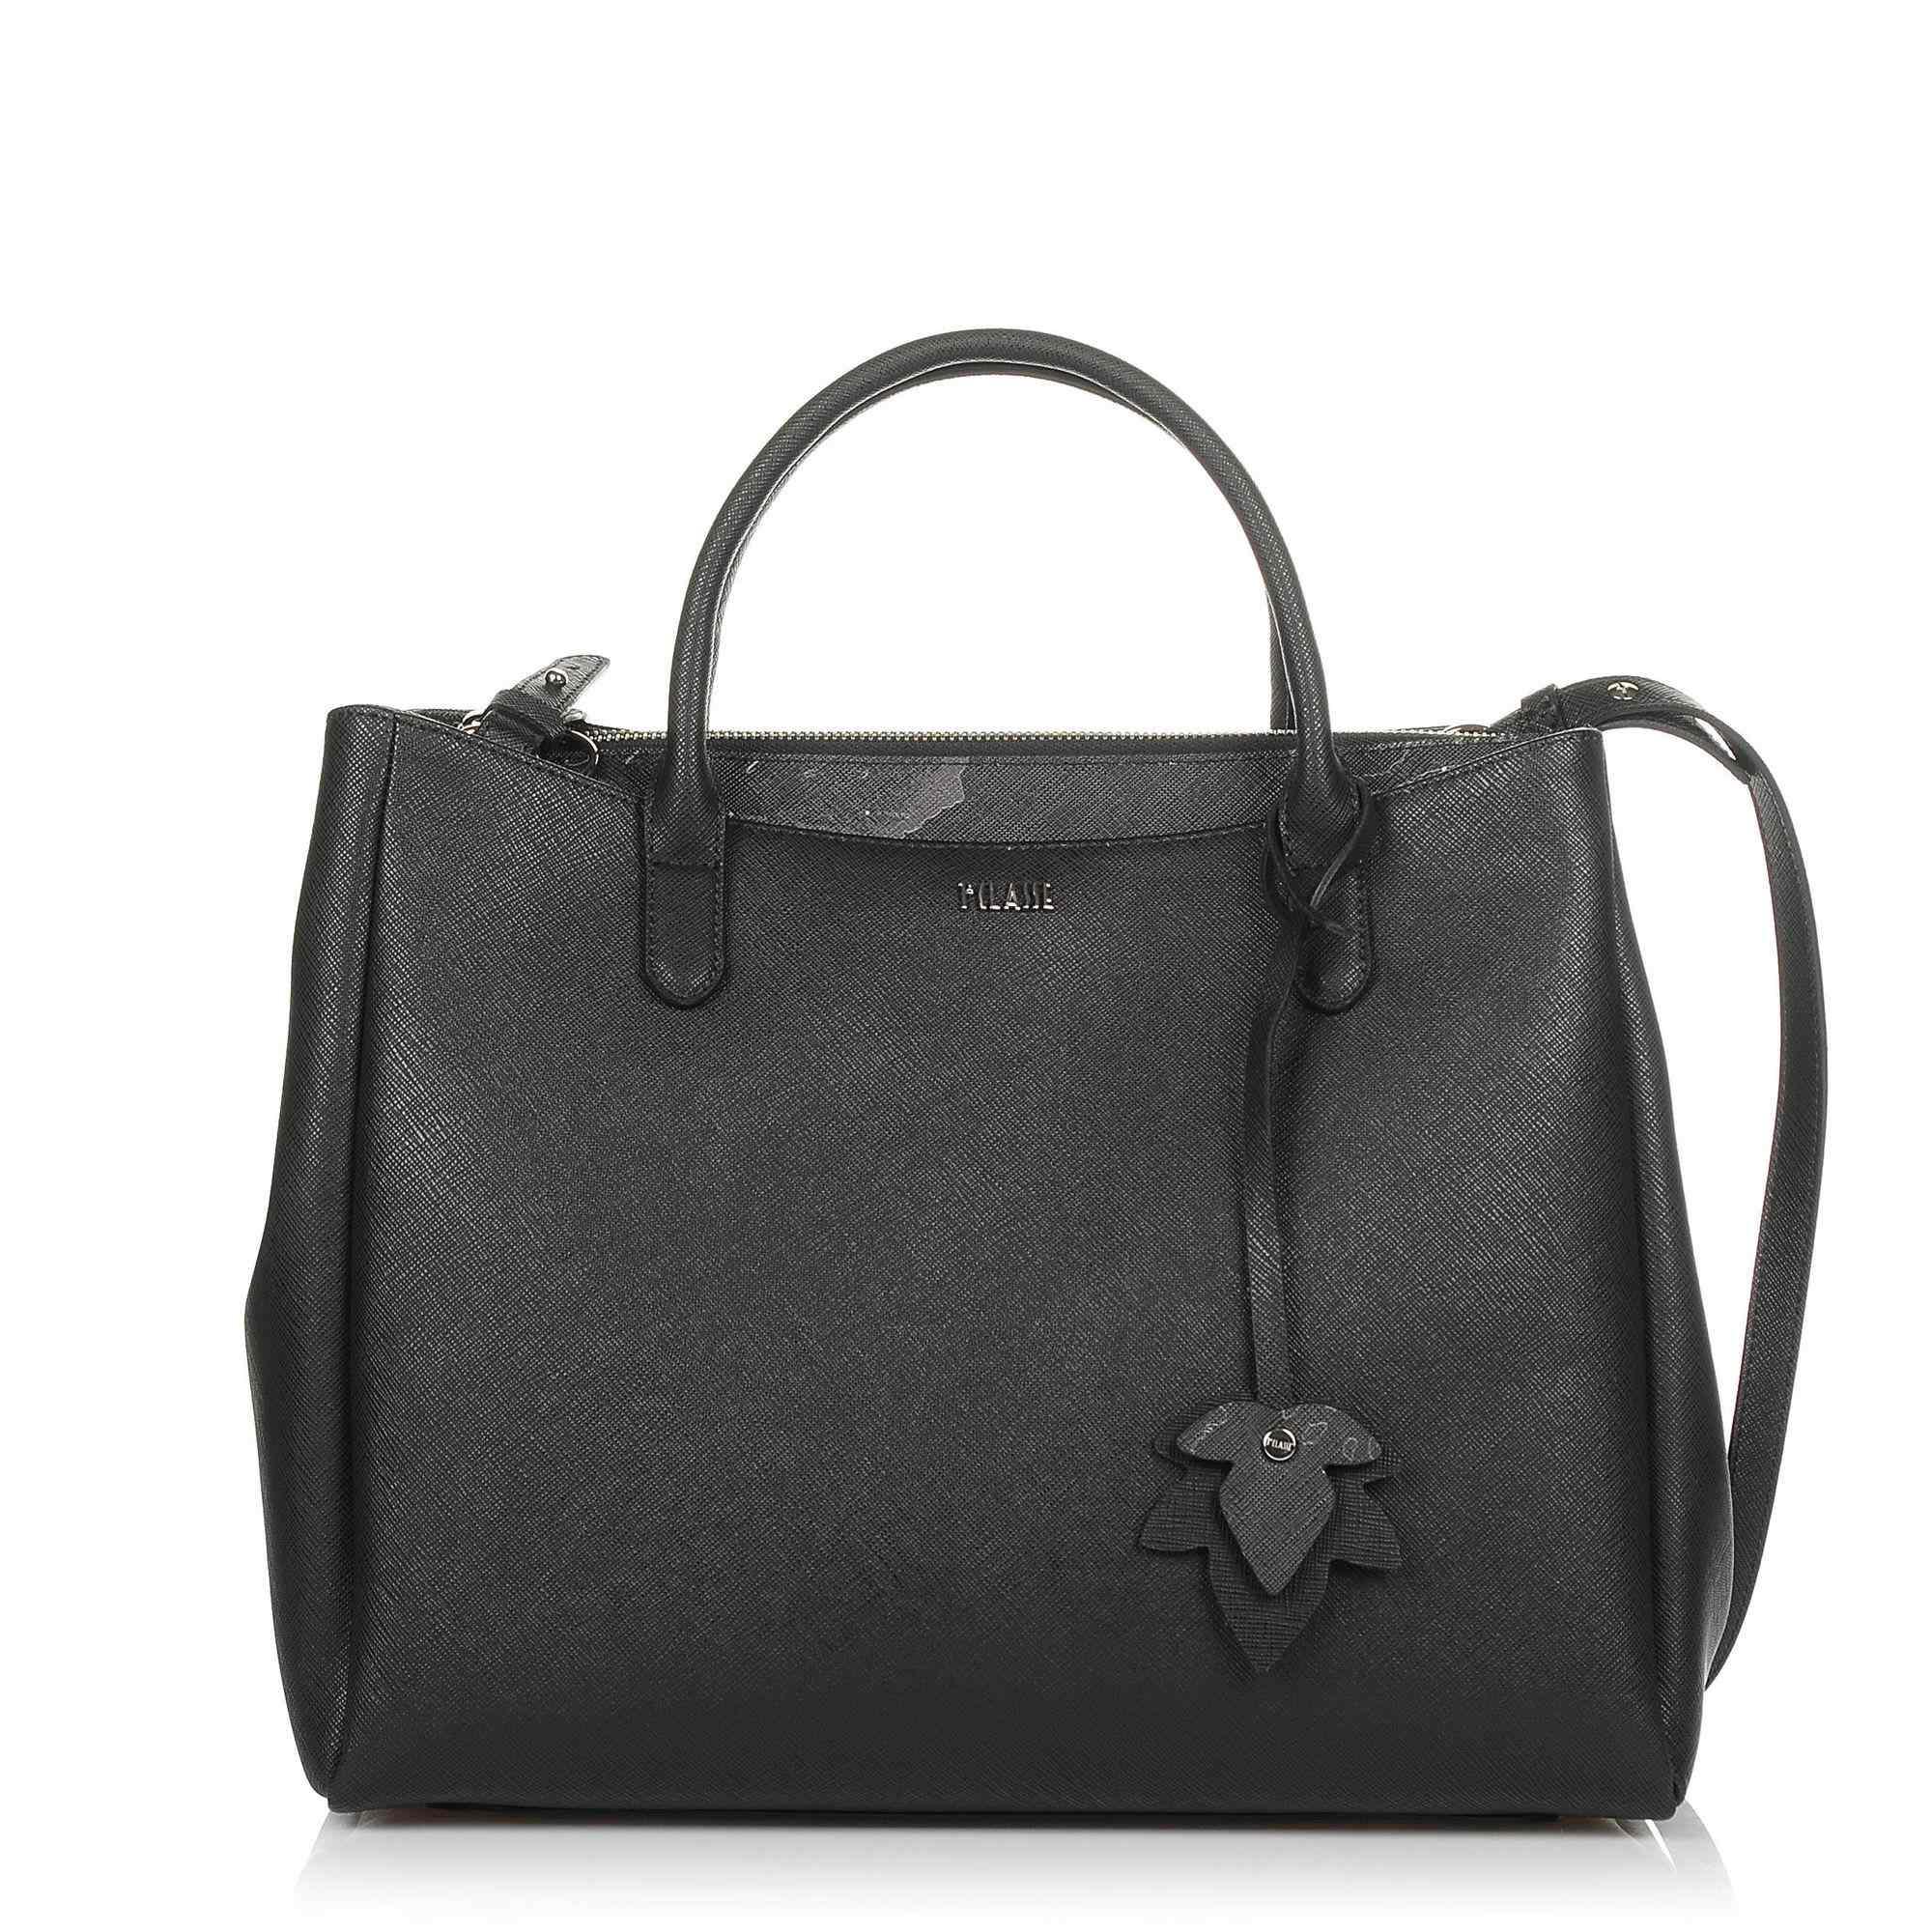 Tote Τσάντα Alviero Martini 1A Classe Hand Bag Borsa 3 LGL679519